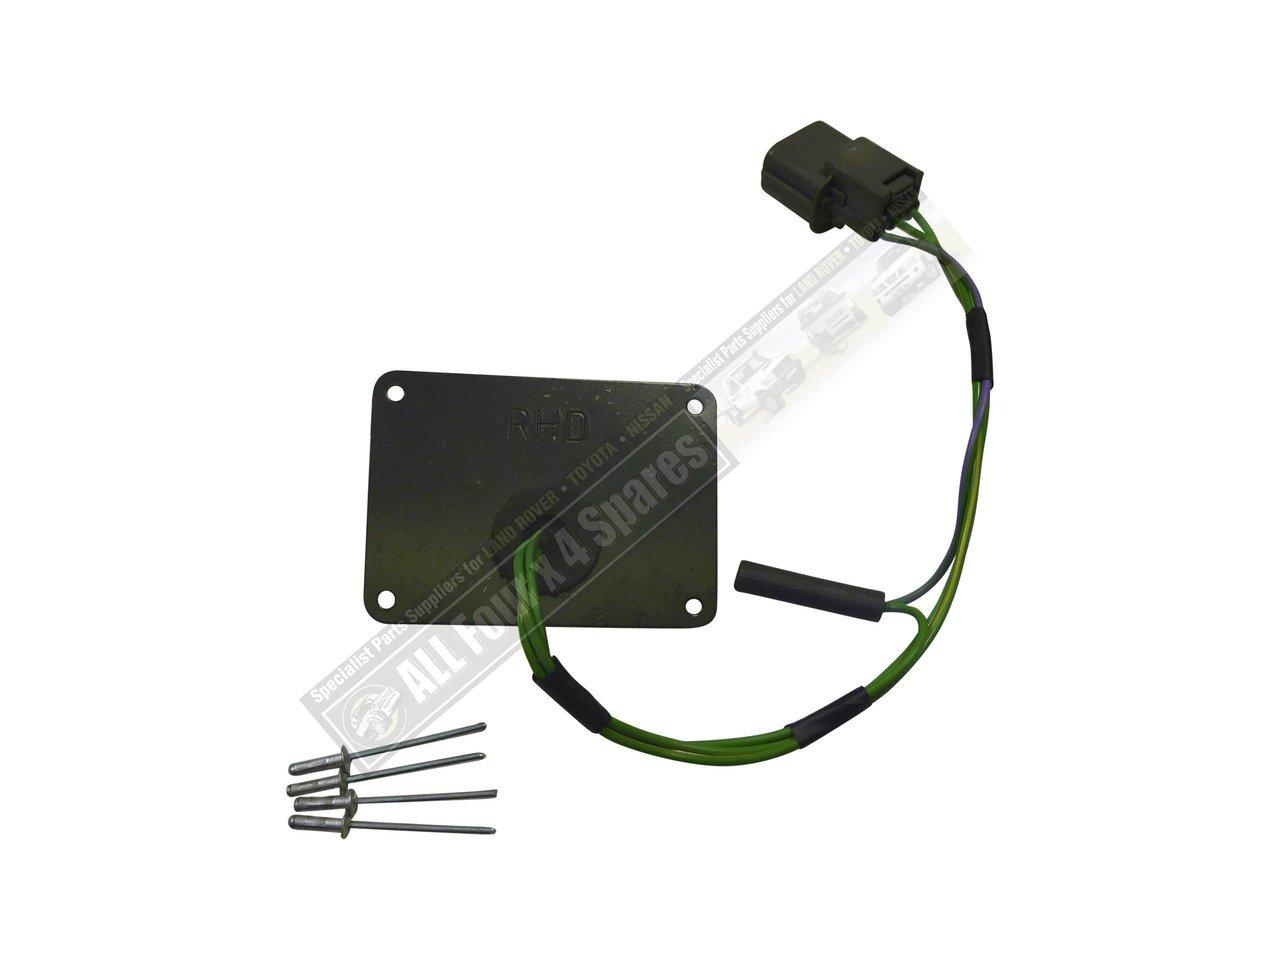 Heater Blower Resistor Harness Land Rover Defender Td5 Genuine Wiring Wire 1999 2005 Jgk100160